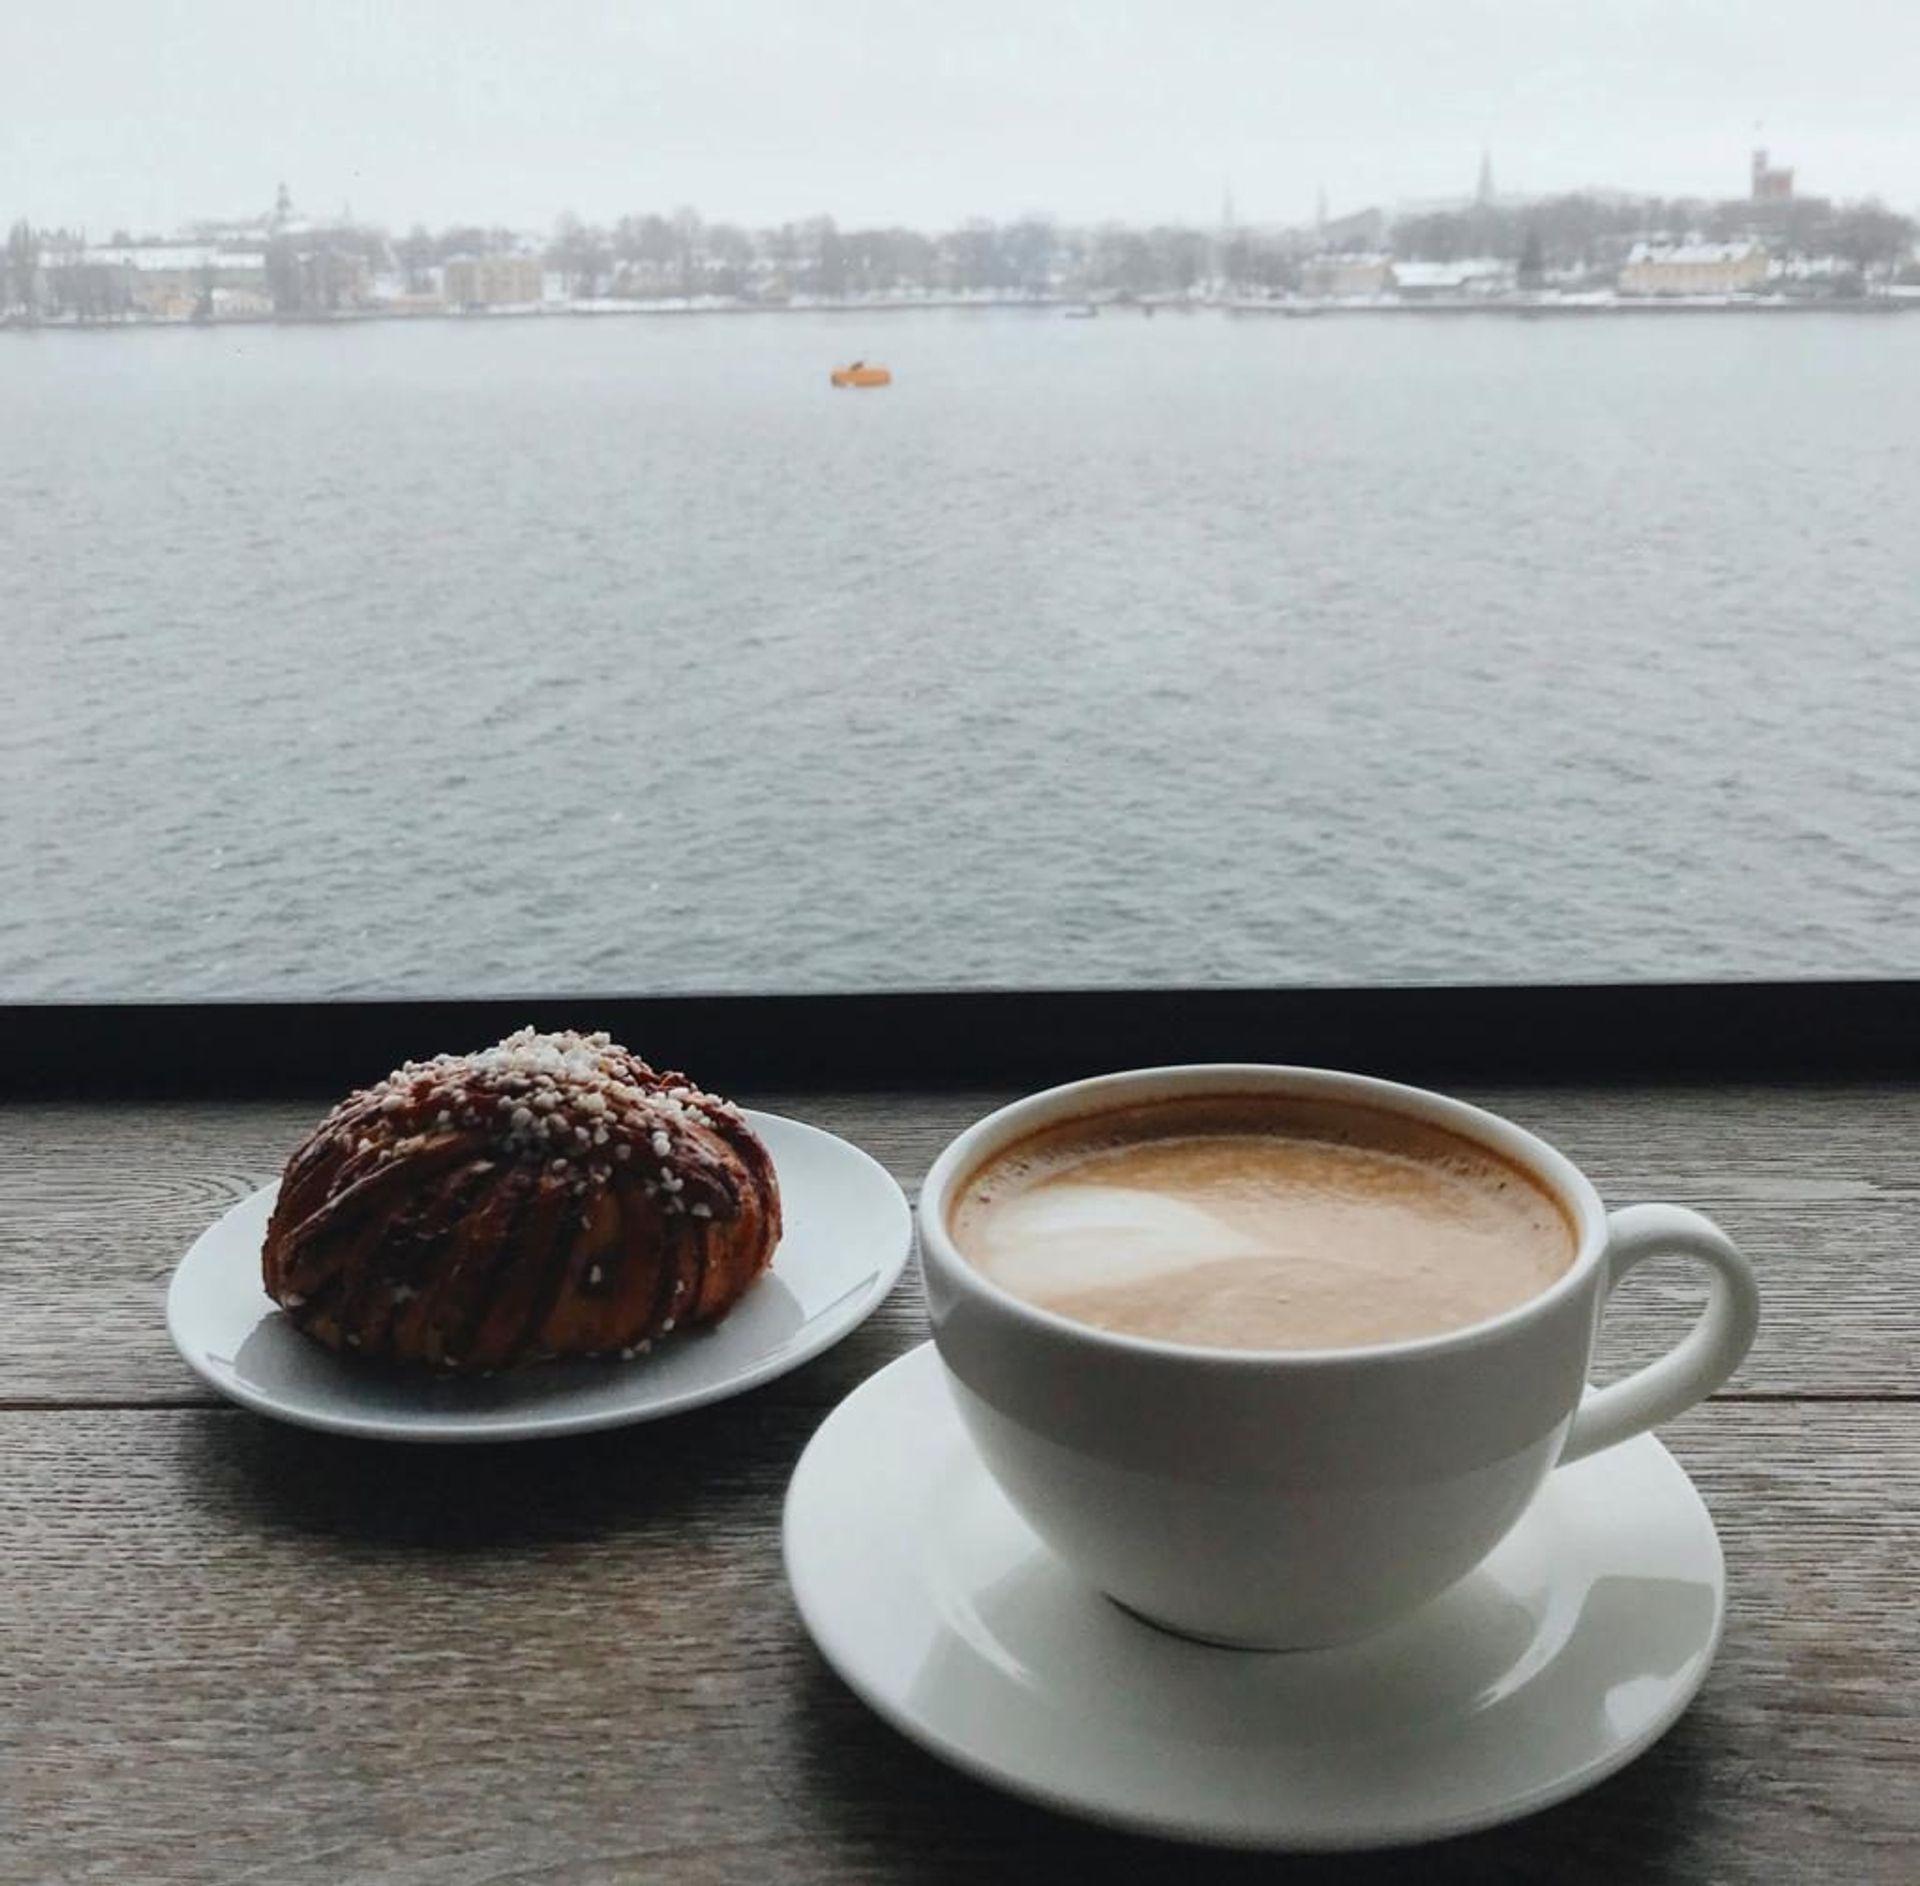 A cinnamon bun and cup of coffee.